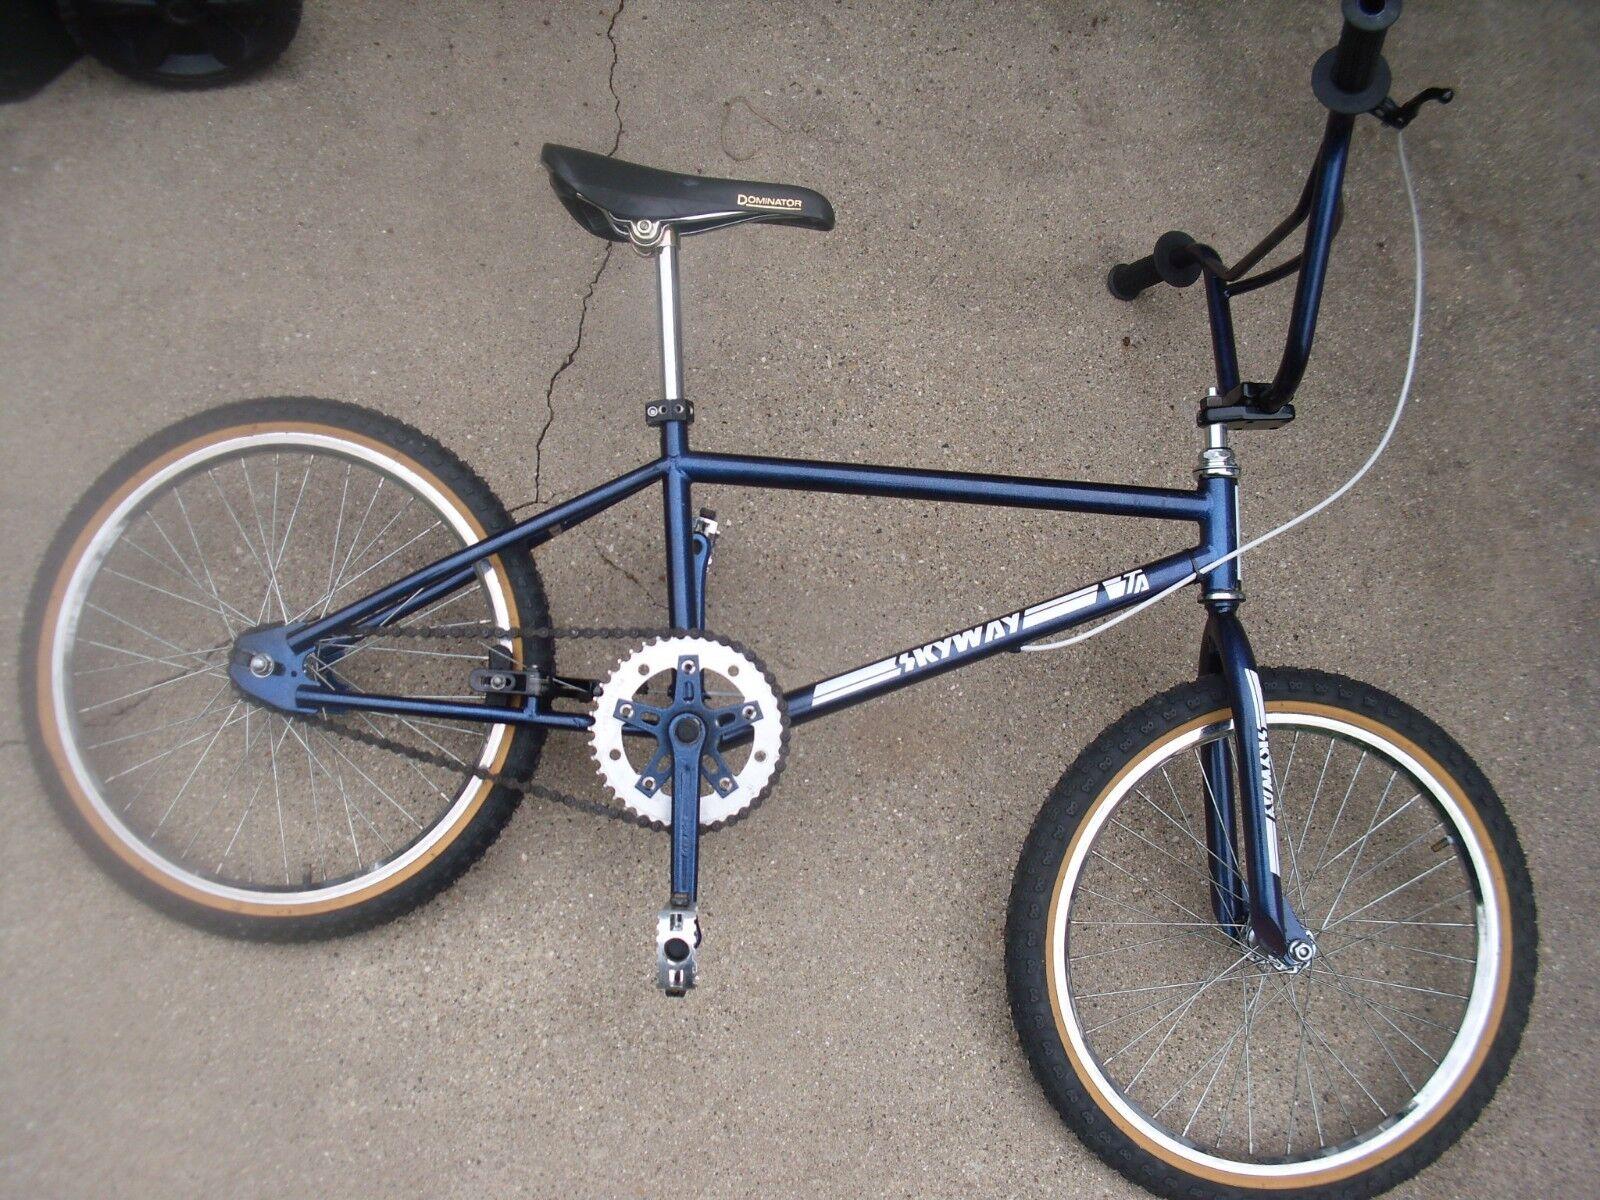 Old School Skyway 300 TA Viscount comp 3 Suzue Maxy 3 piece cranks bmx bike